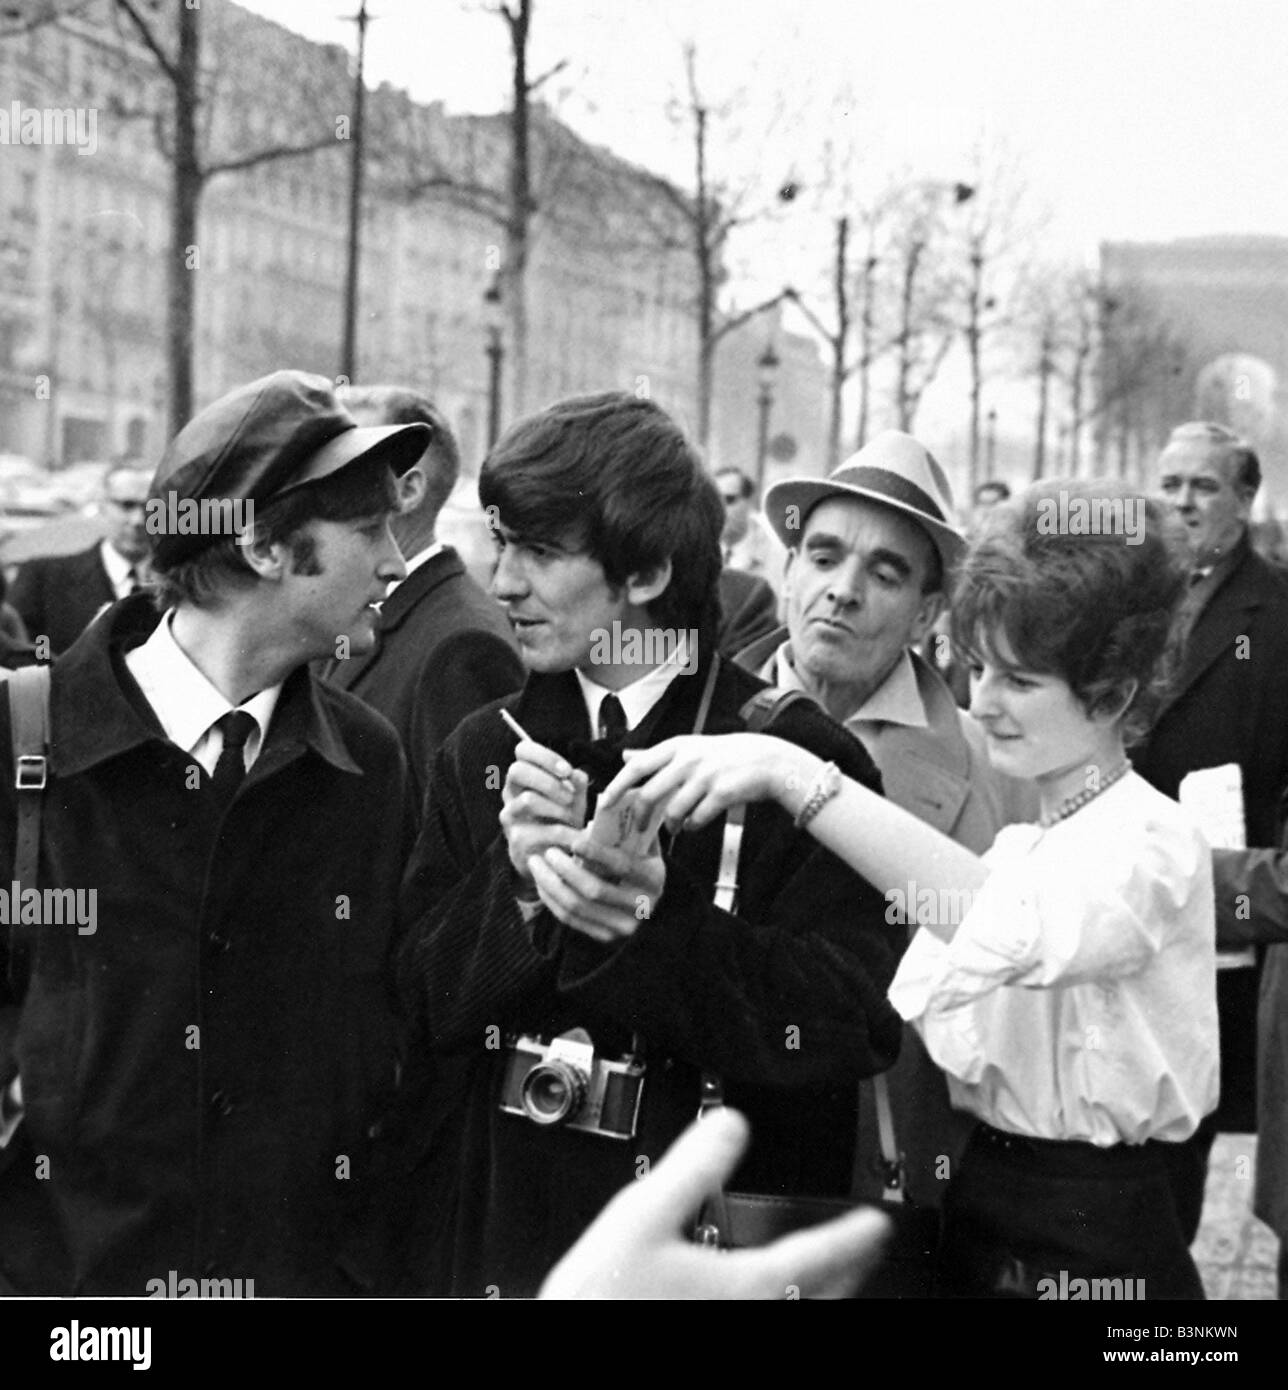 Beatles Files 1964 John Lennon George Harrison Sign Autographs For Fans During The Visit To Paris January